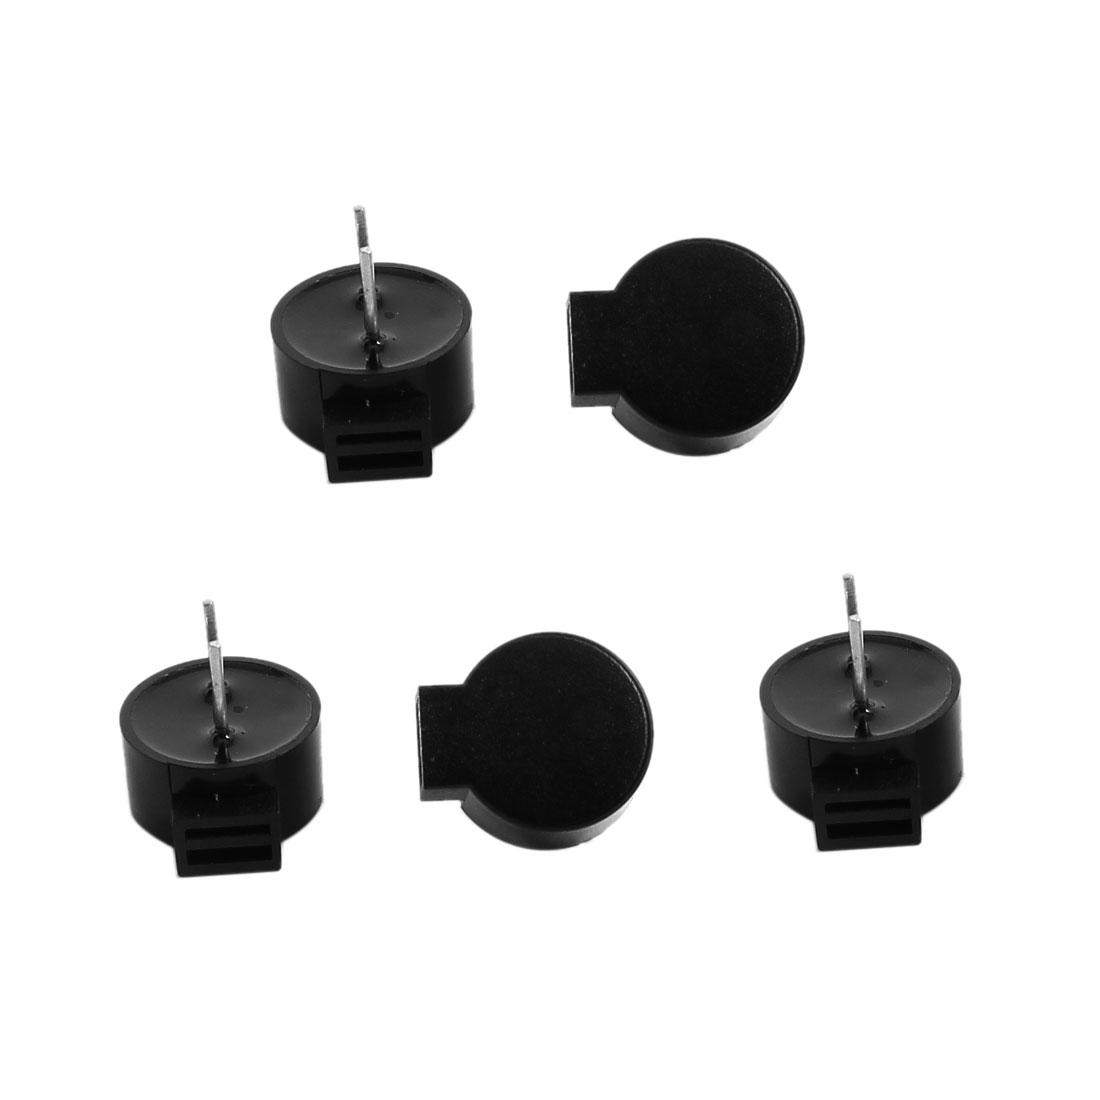 5 Pcs DC 3/5V 60mA Passive Electronic Continuous Sound Buzzer 11x9.5x5mm